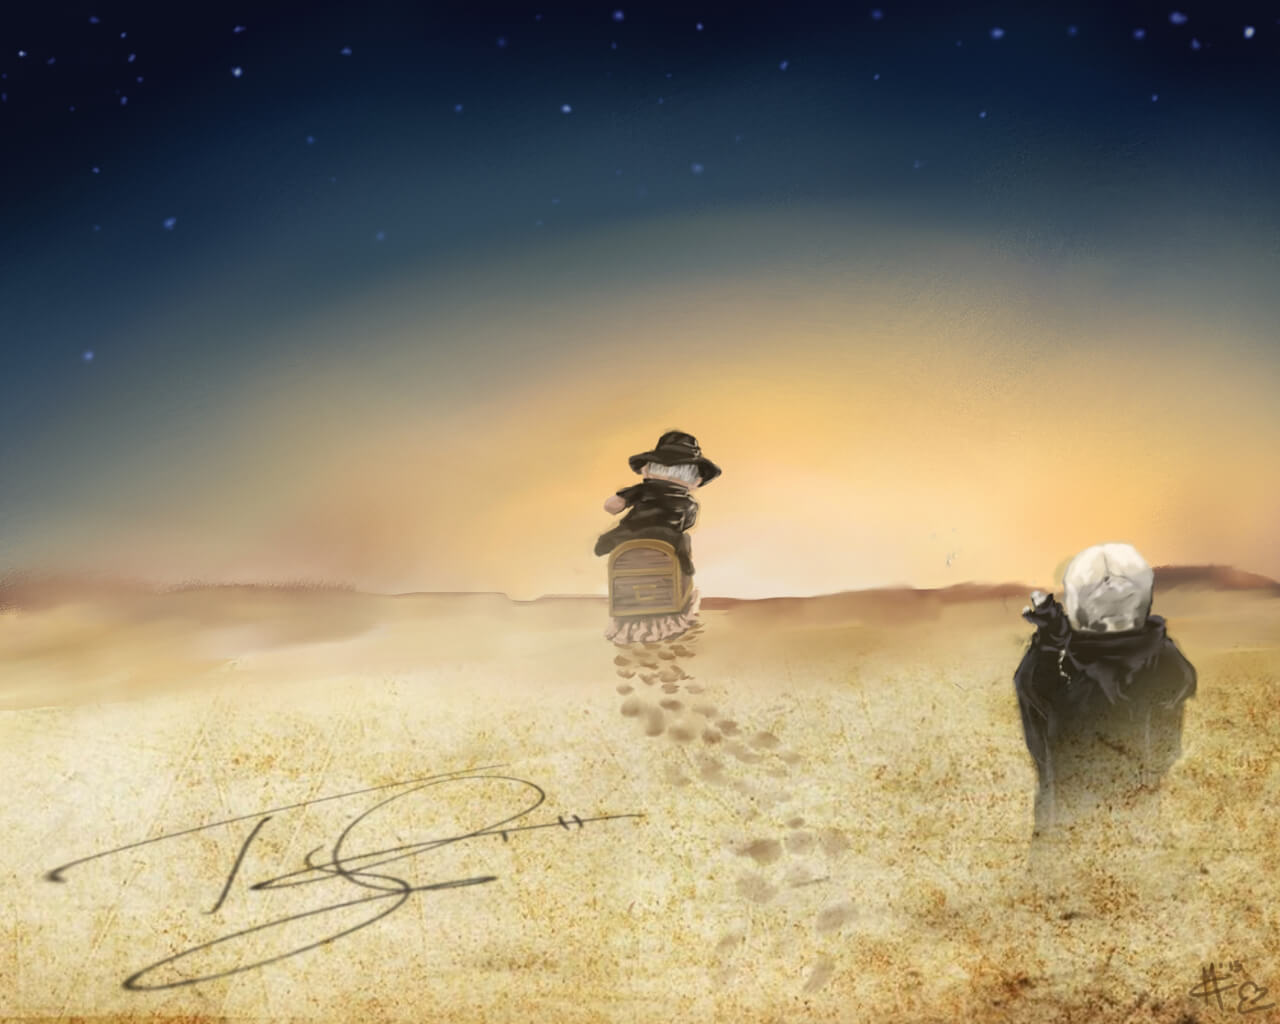 Terry Pratchett memorial wallpaper Dreams of Ego 1280x1024